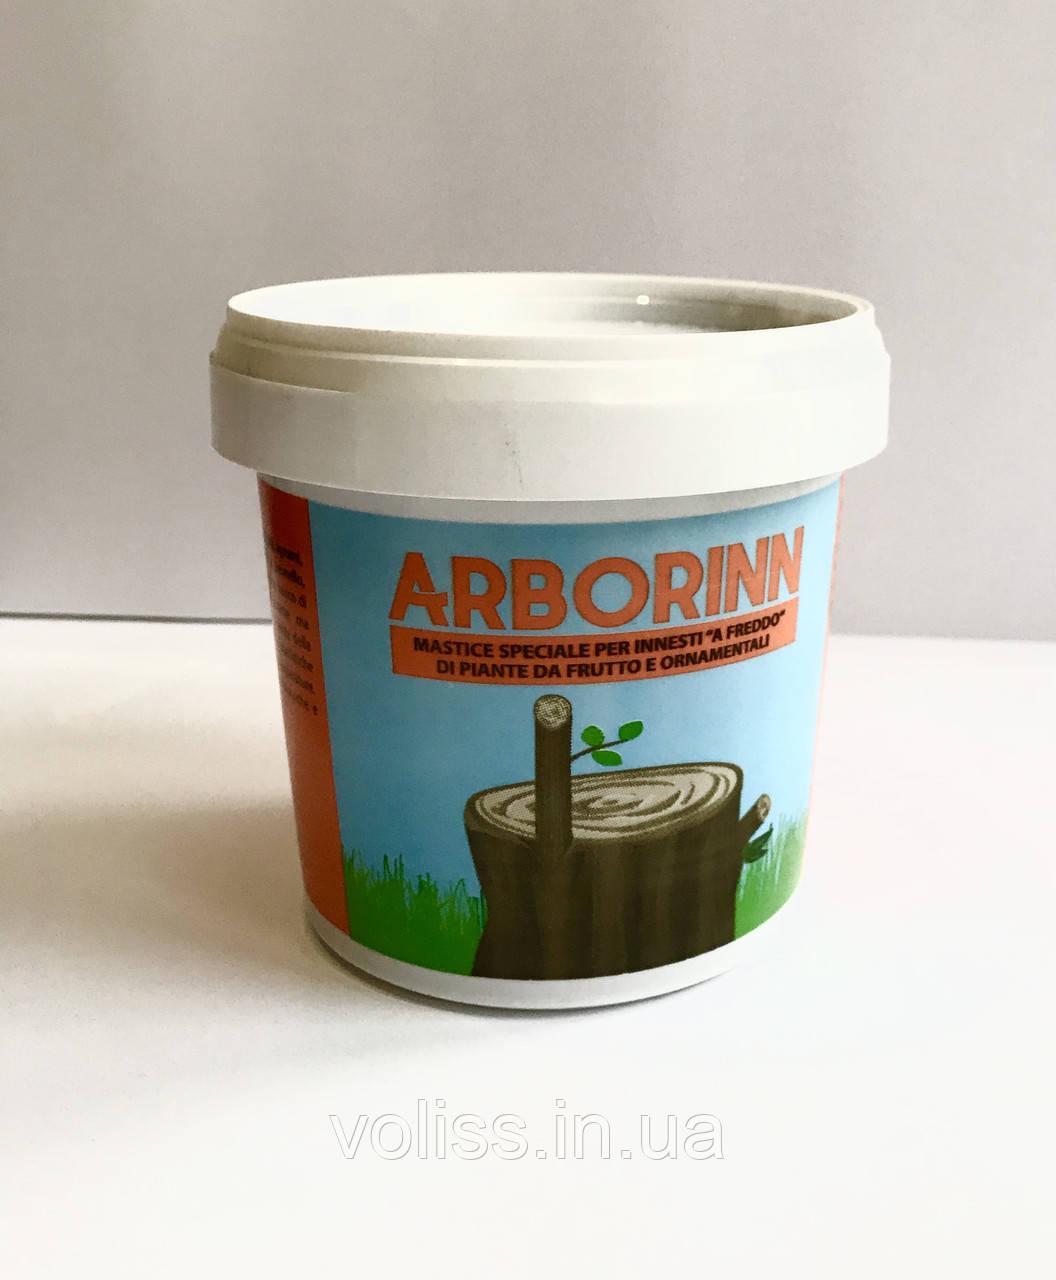 Мастика для холодной прививки Arborinn 0,5кг